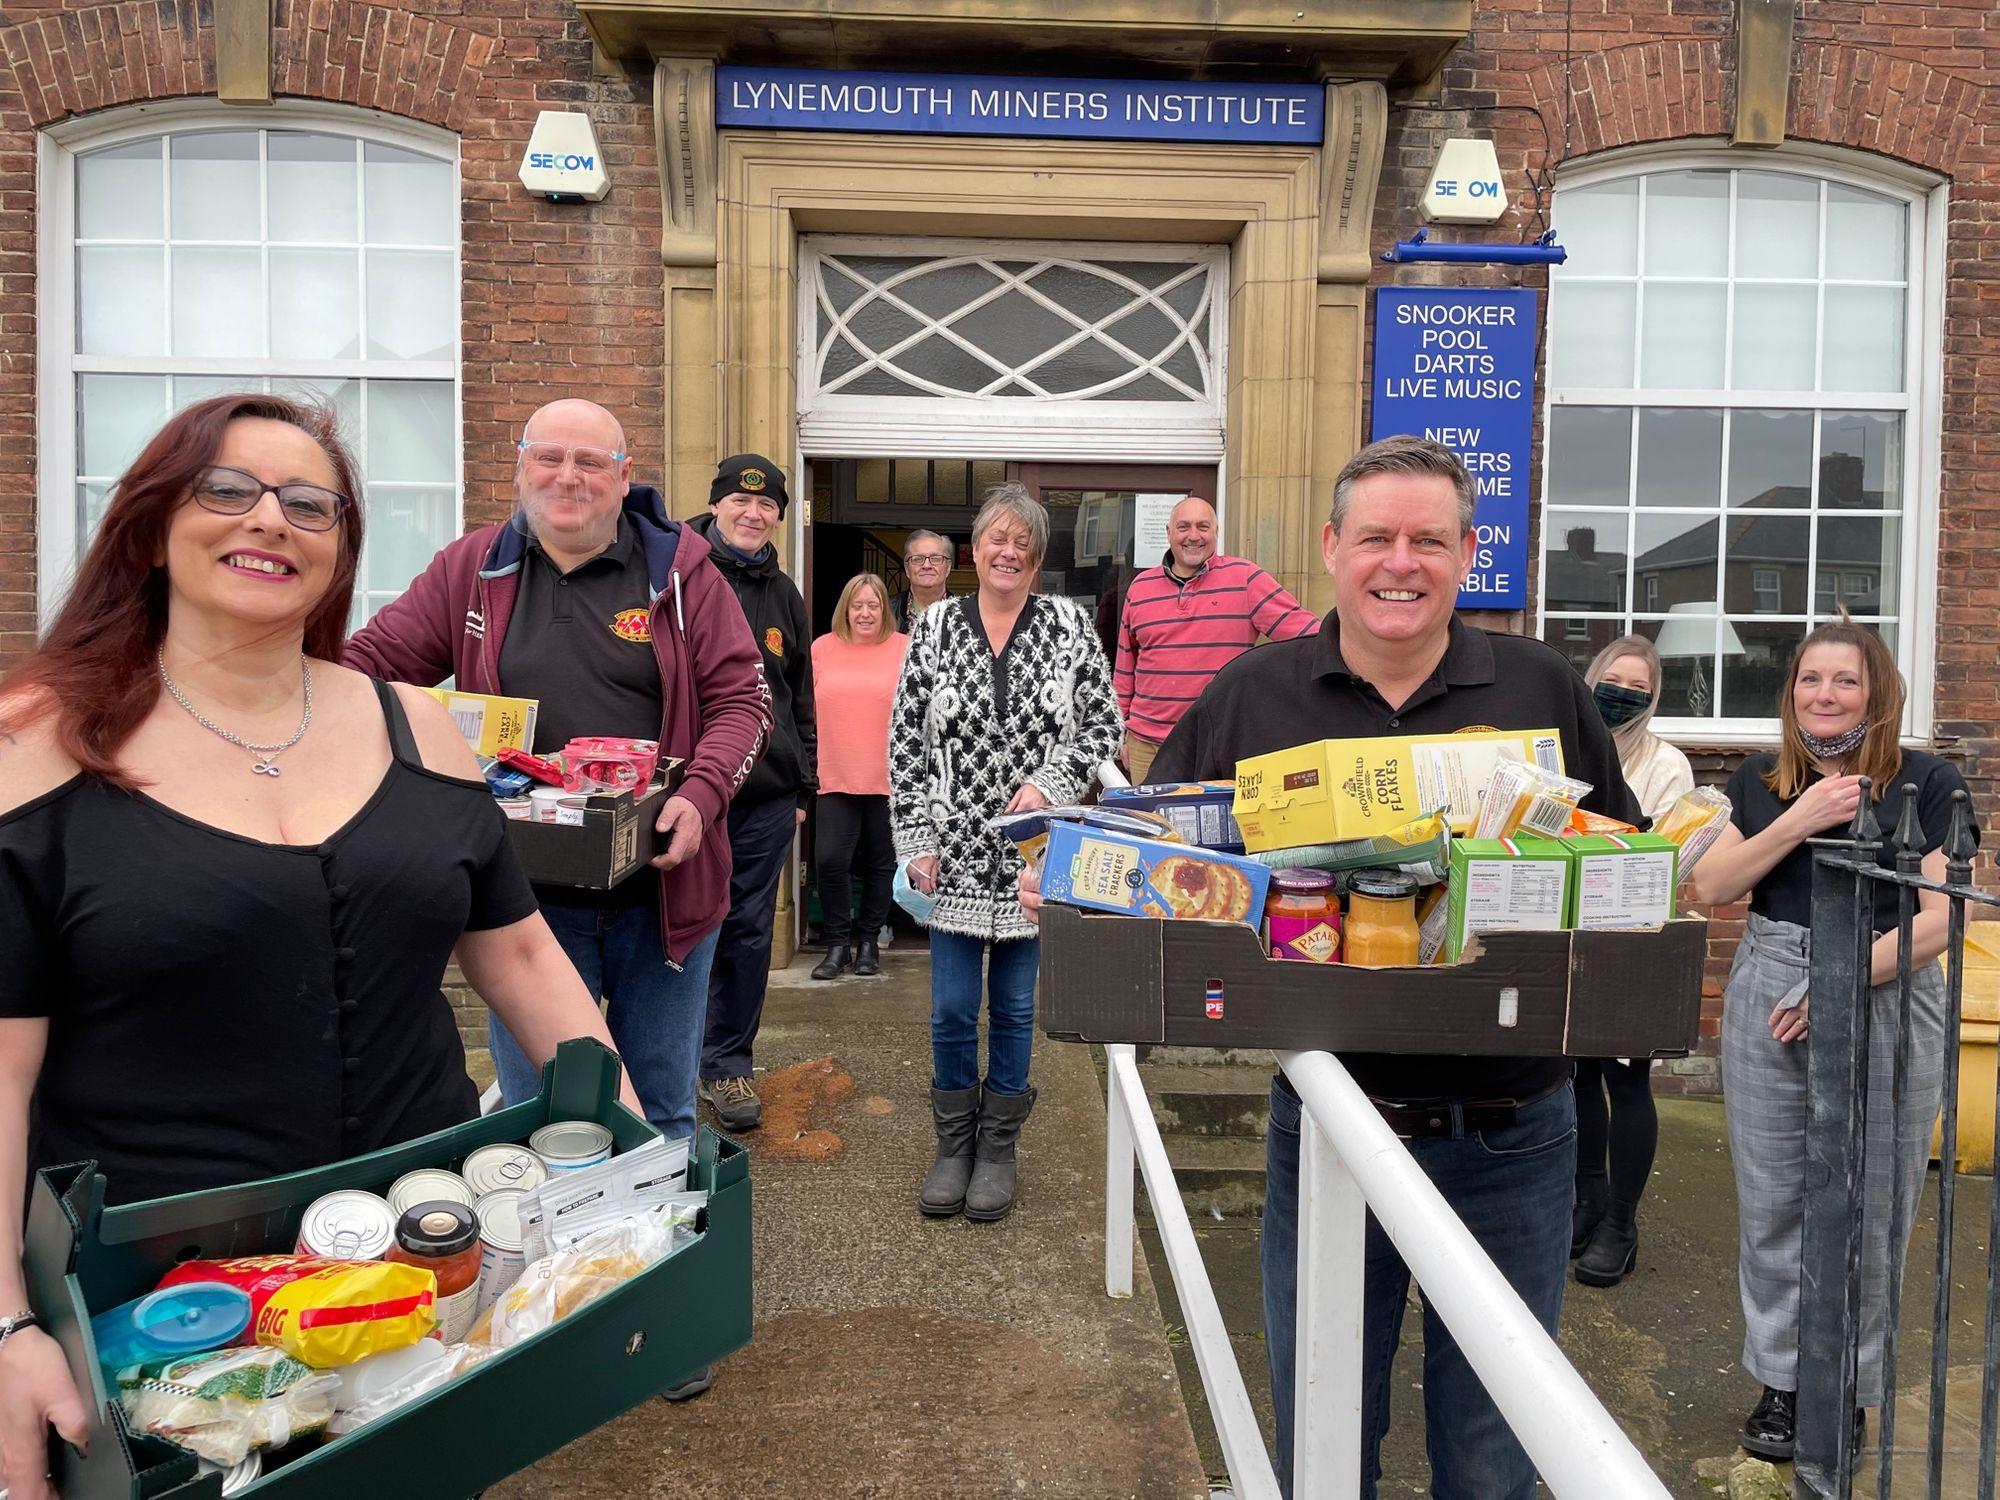 England - Freemasons donate to Lynemouth and Ellington based foodbank